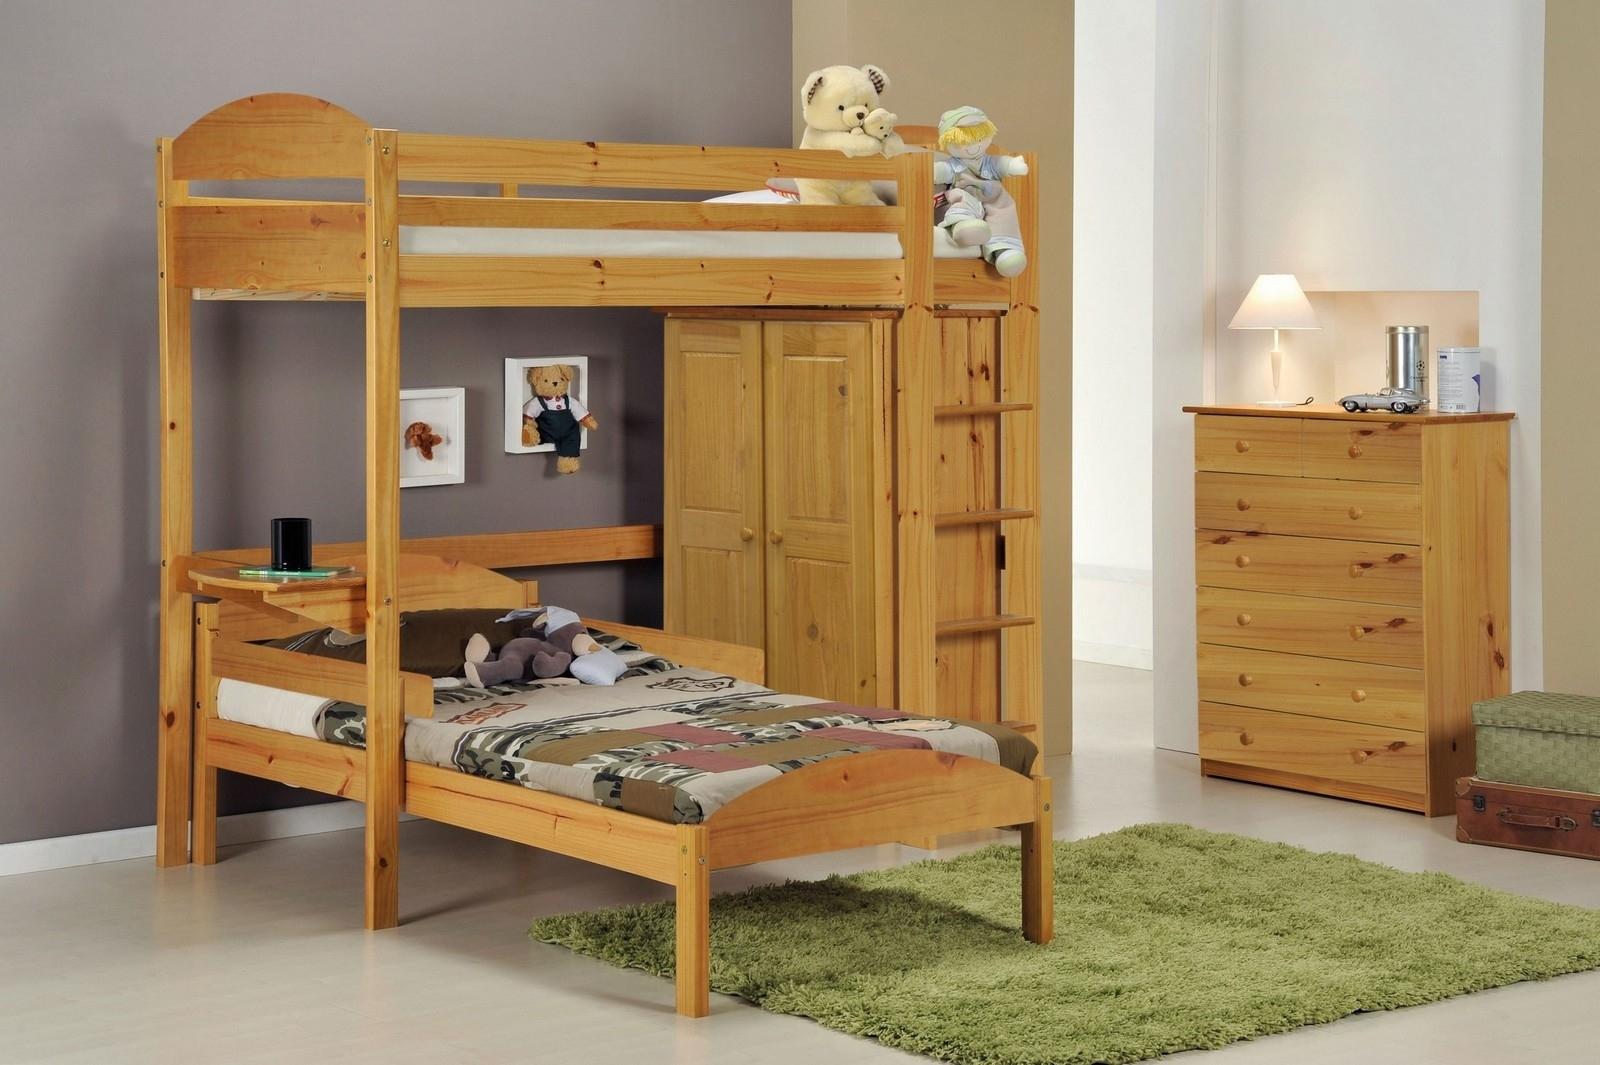 ensemble lit mezzanine en l placard commode pin miel aladin. Black Bedroom Furniture Sets. Home Design Ideas